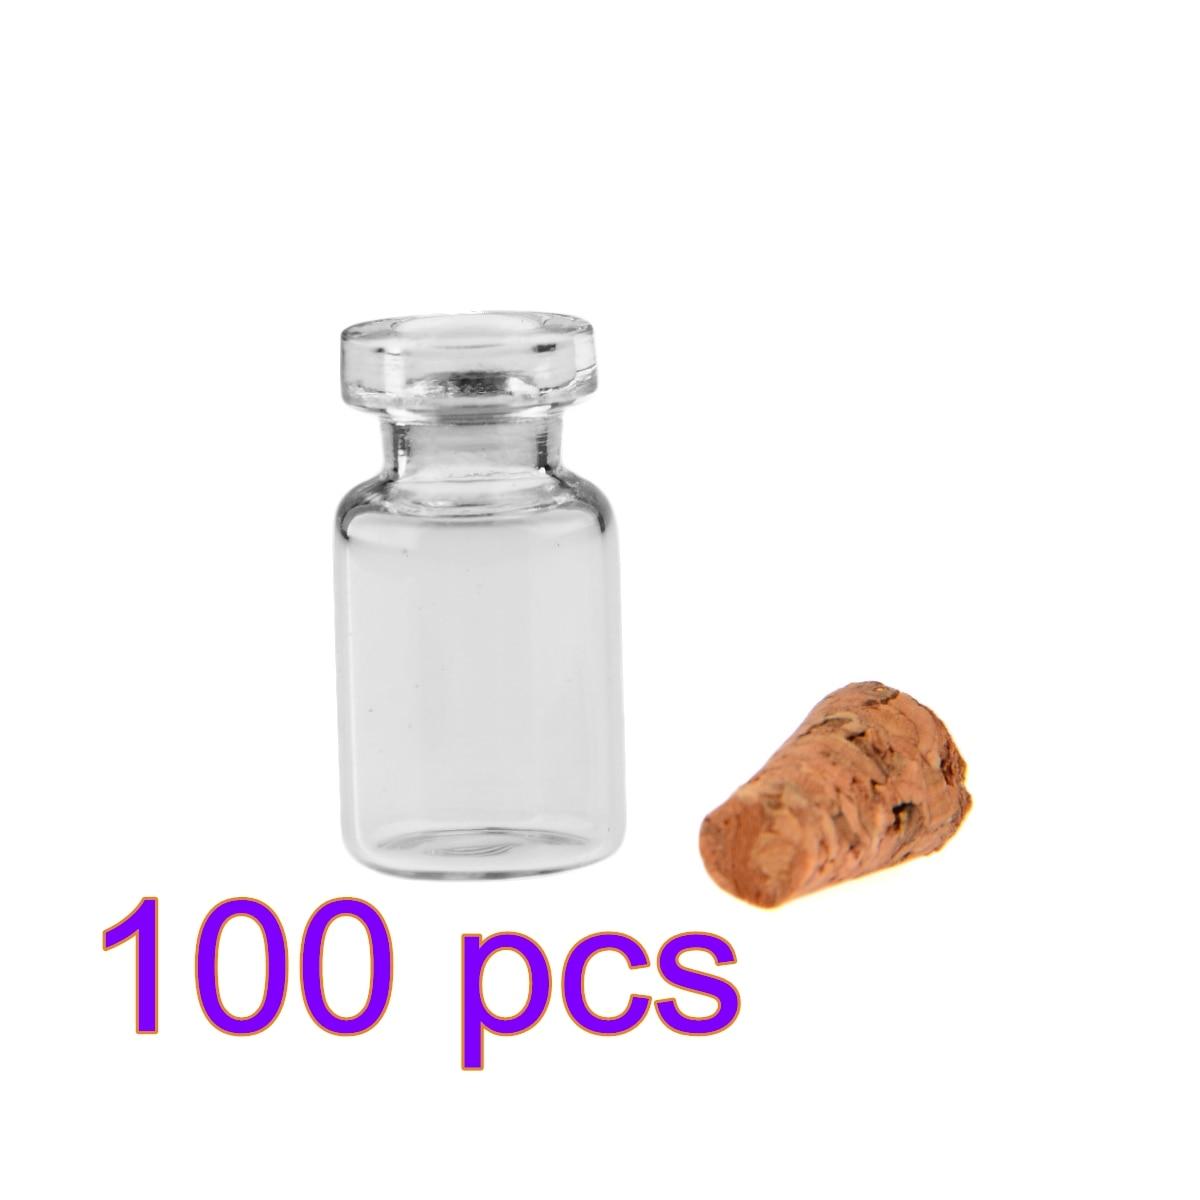 1pcs / 50pcs / 100Pcs 0.5ml Mini Clear Glass Bottle Wishing Bottle Vials Empty Glass Jars Weddings Wish Jewelry Party Favors